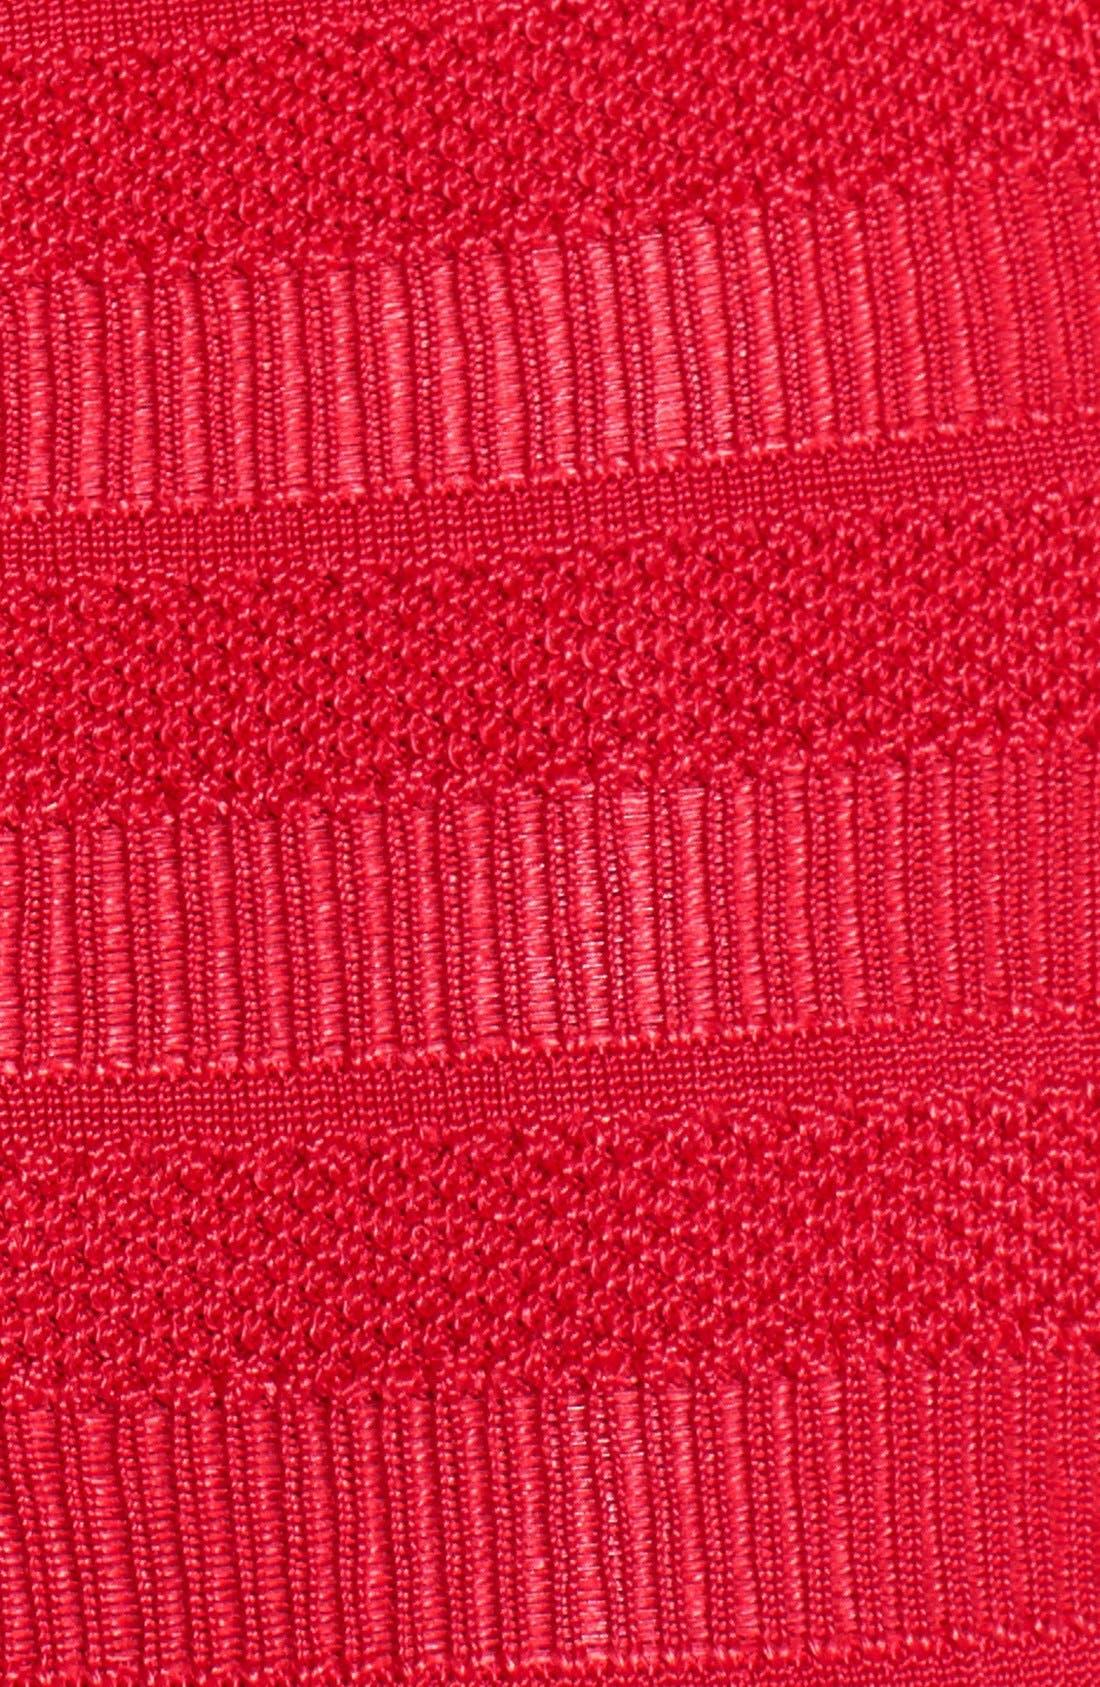 Alternate Image 4  - French Connection 'Summer Spotlight' Knit Bandage Dress